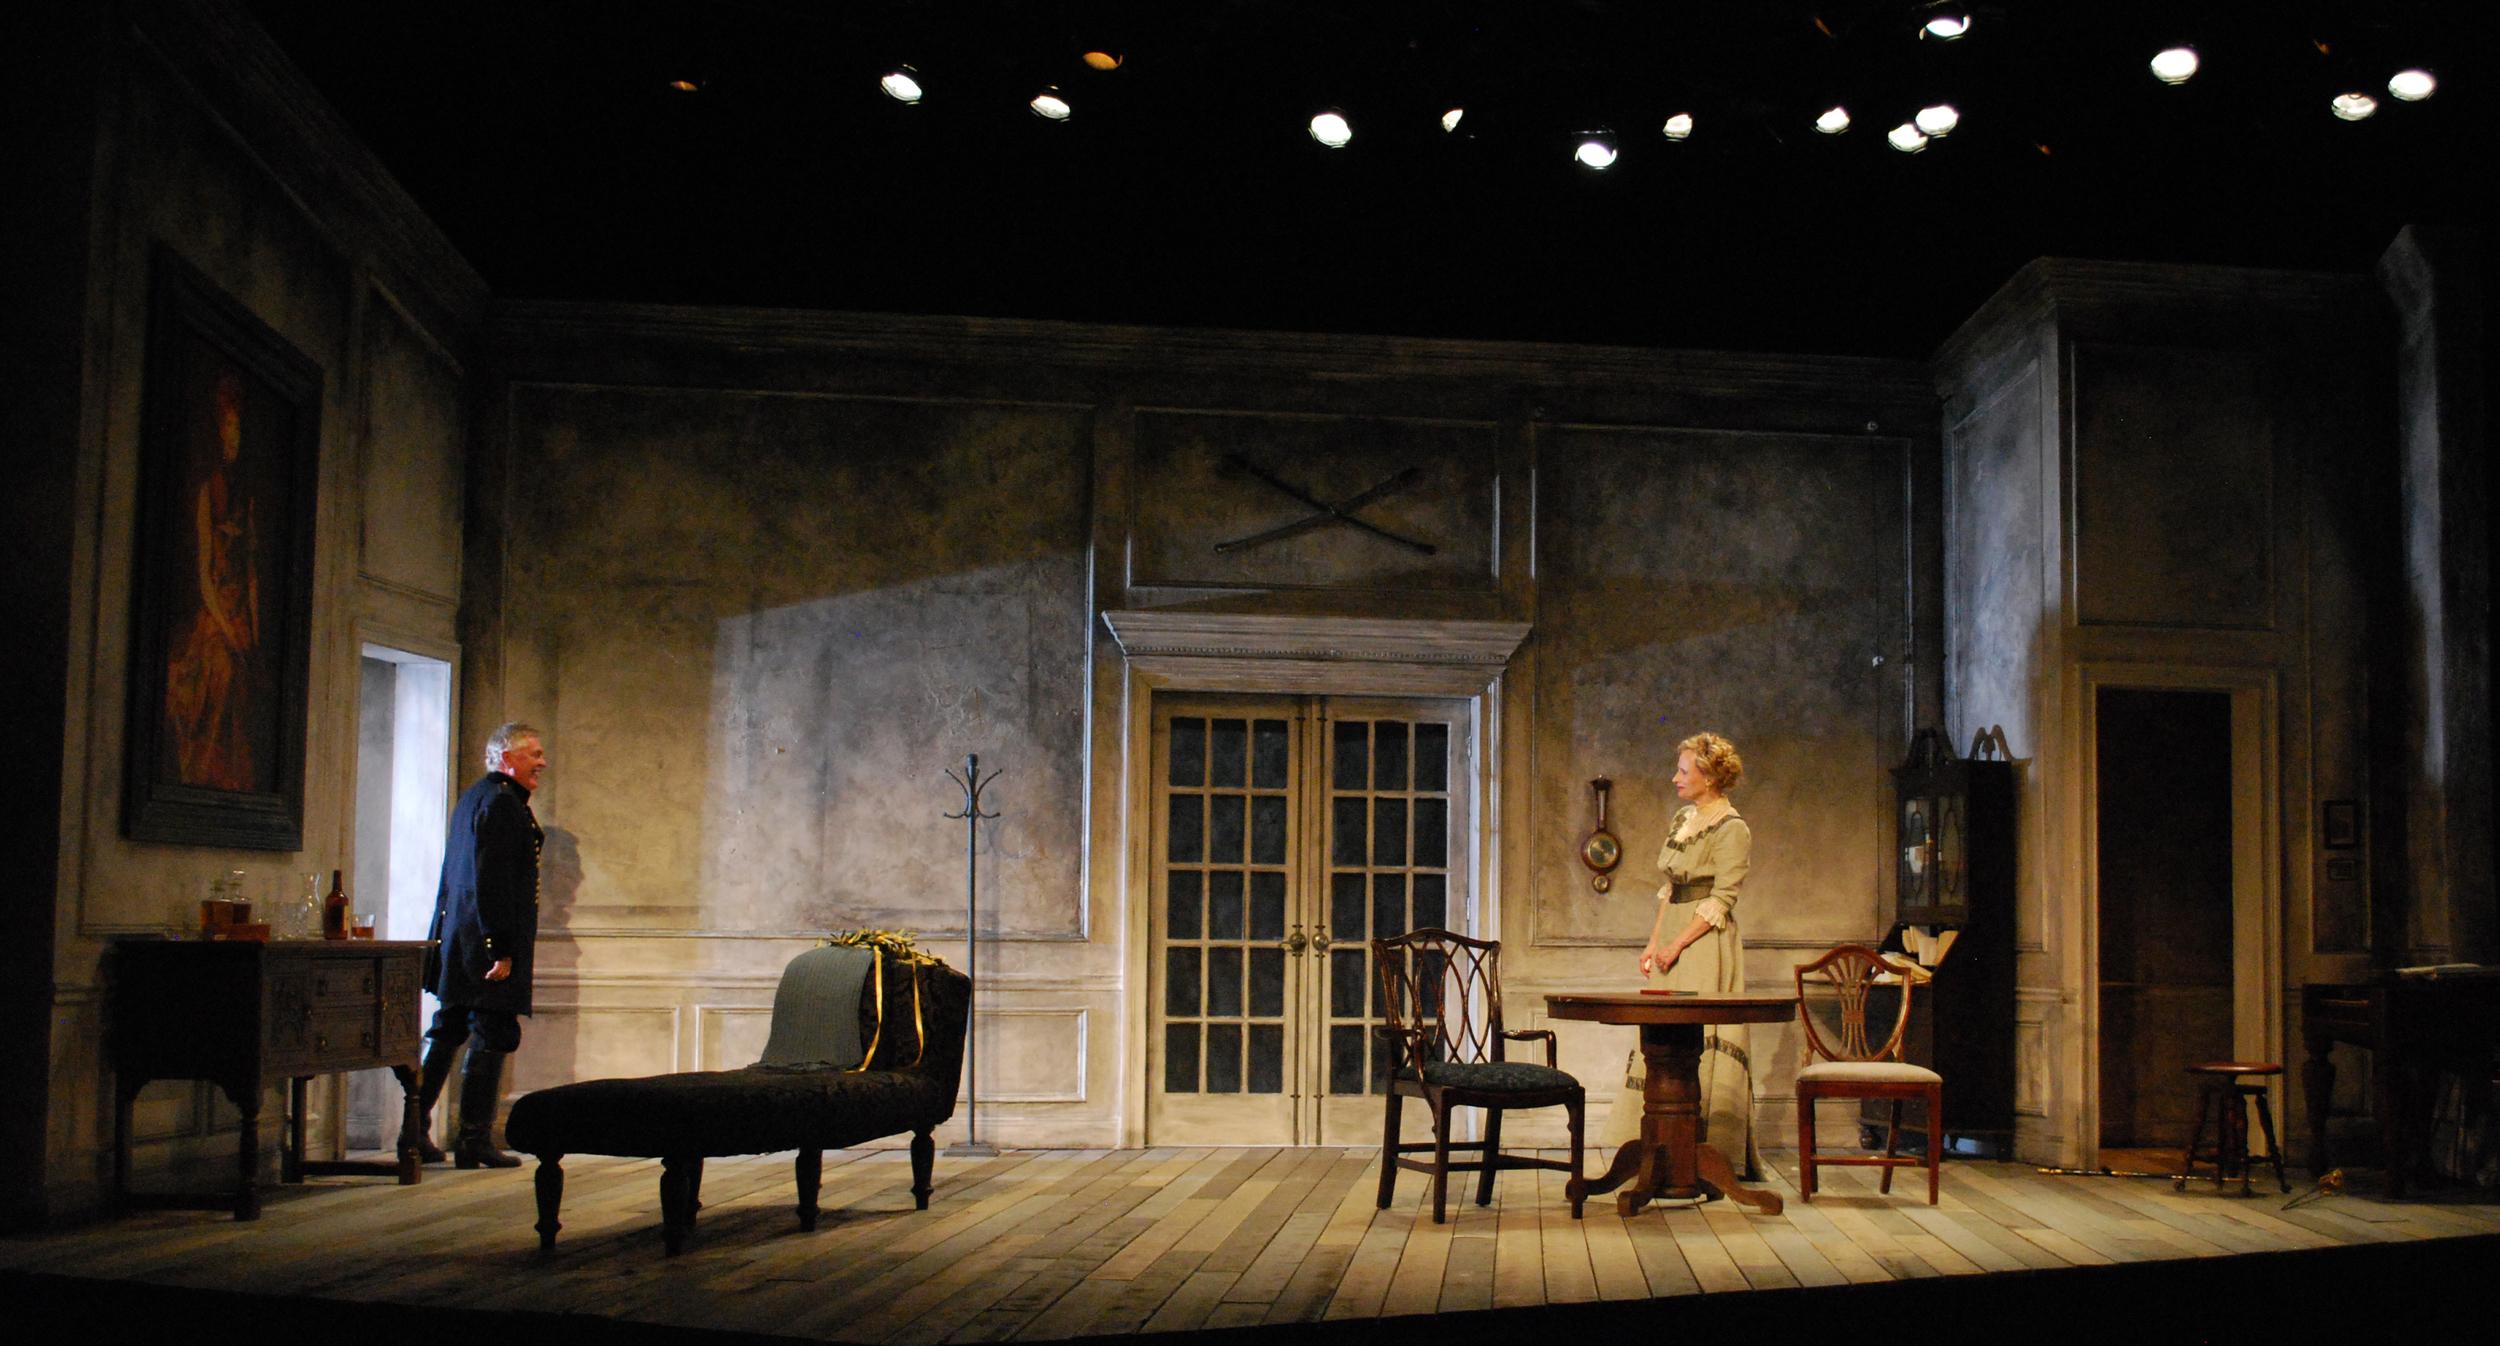 Off Broadway Lortel Theater: Dance of Death